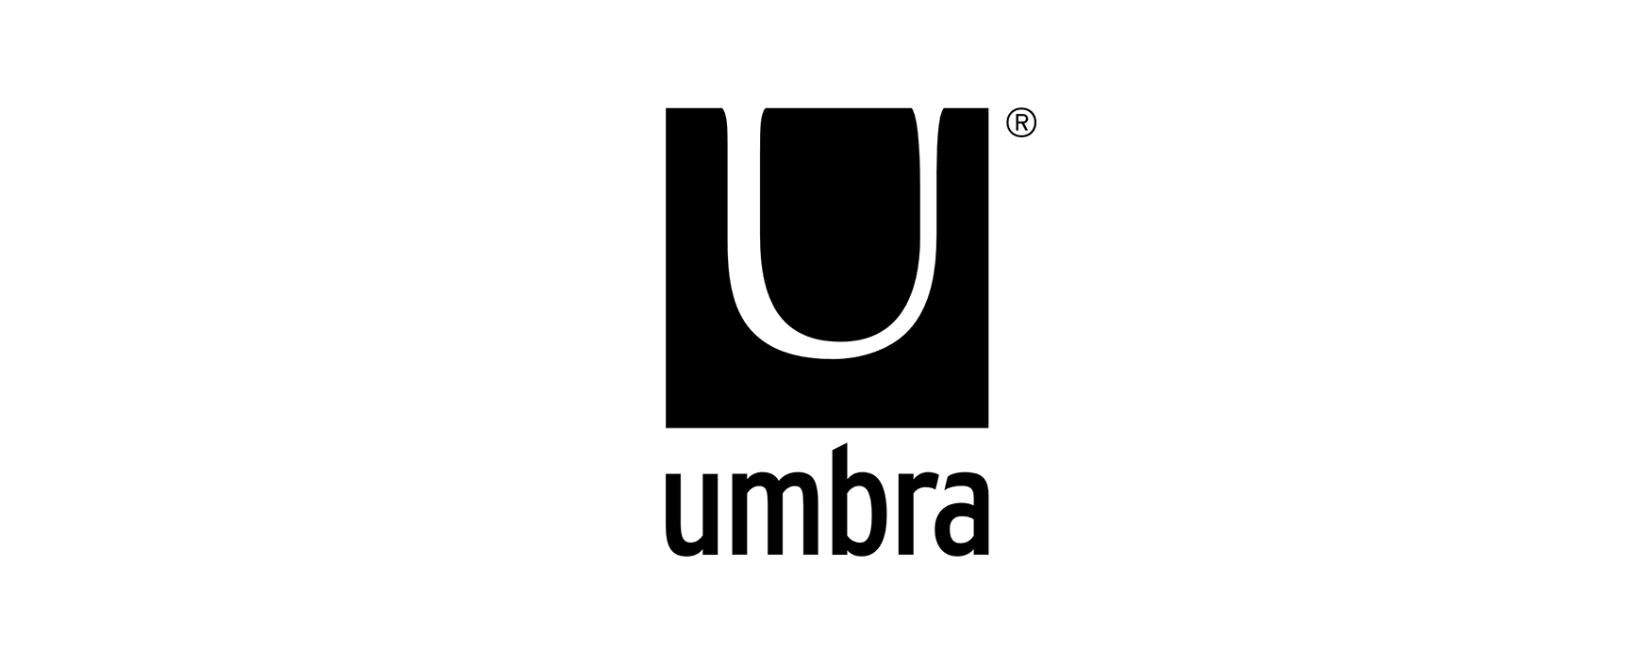 Umbra Discount Code 2021